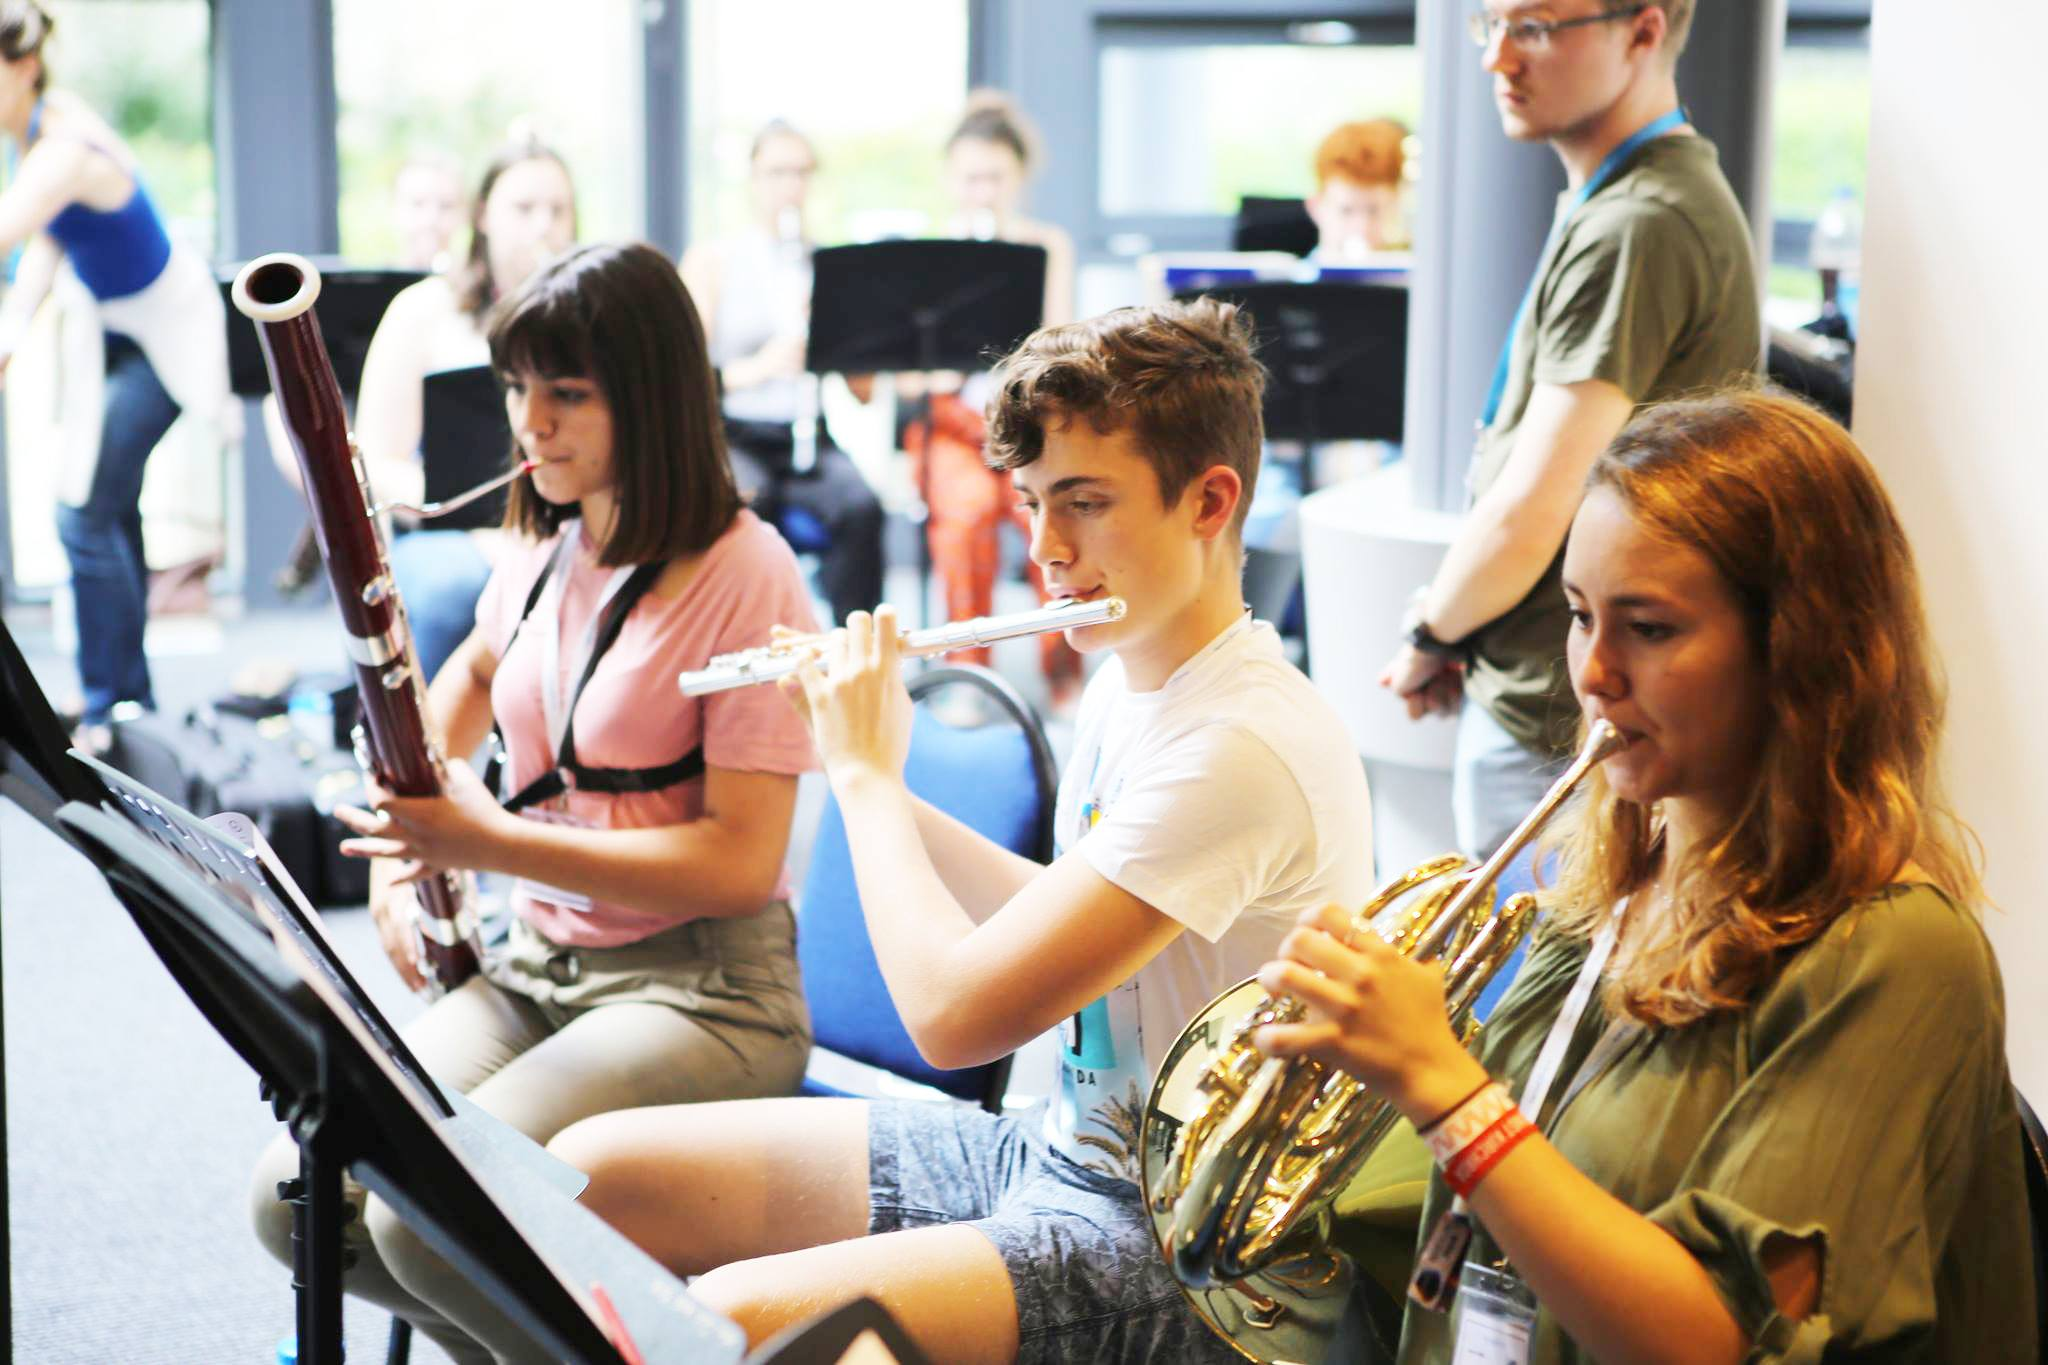 Orchestra course England summer 2018